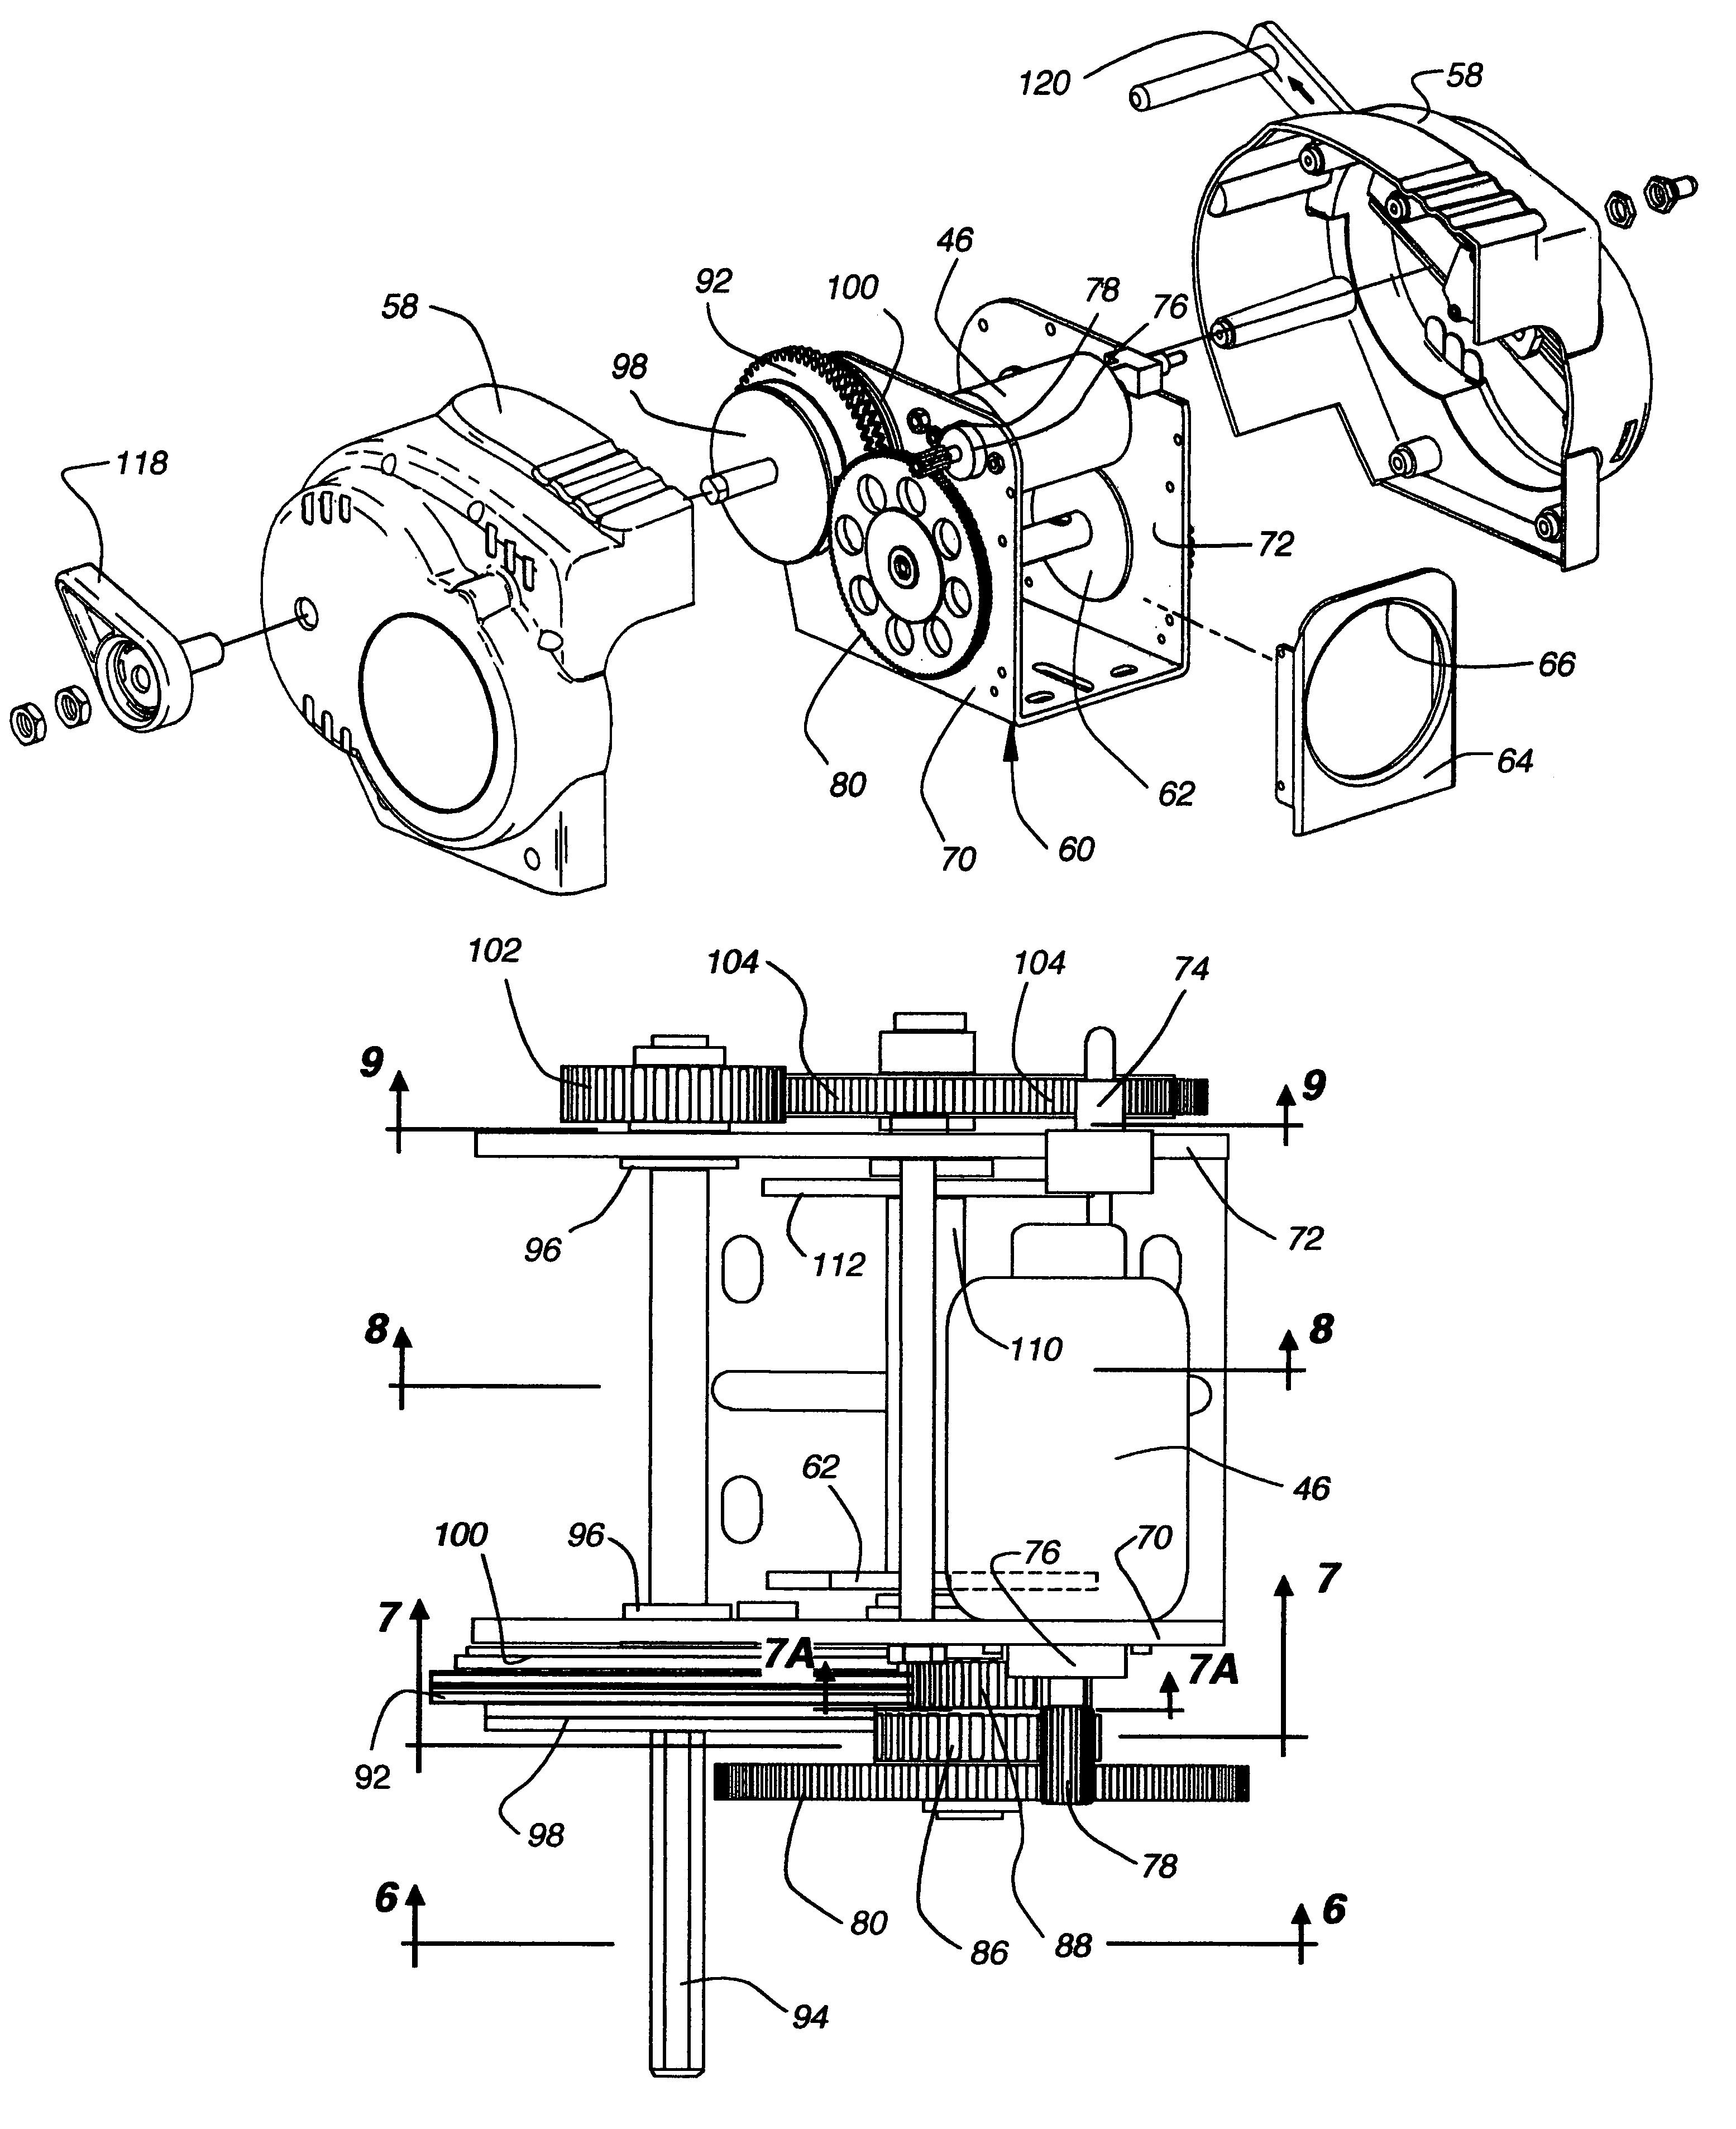 Patent Us7017887 Winch For Boat Trailer Google Patents Kawasaki Kmx 125 Wiring Diagram Drawing